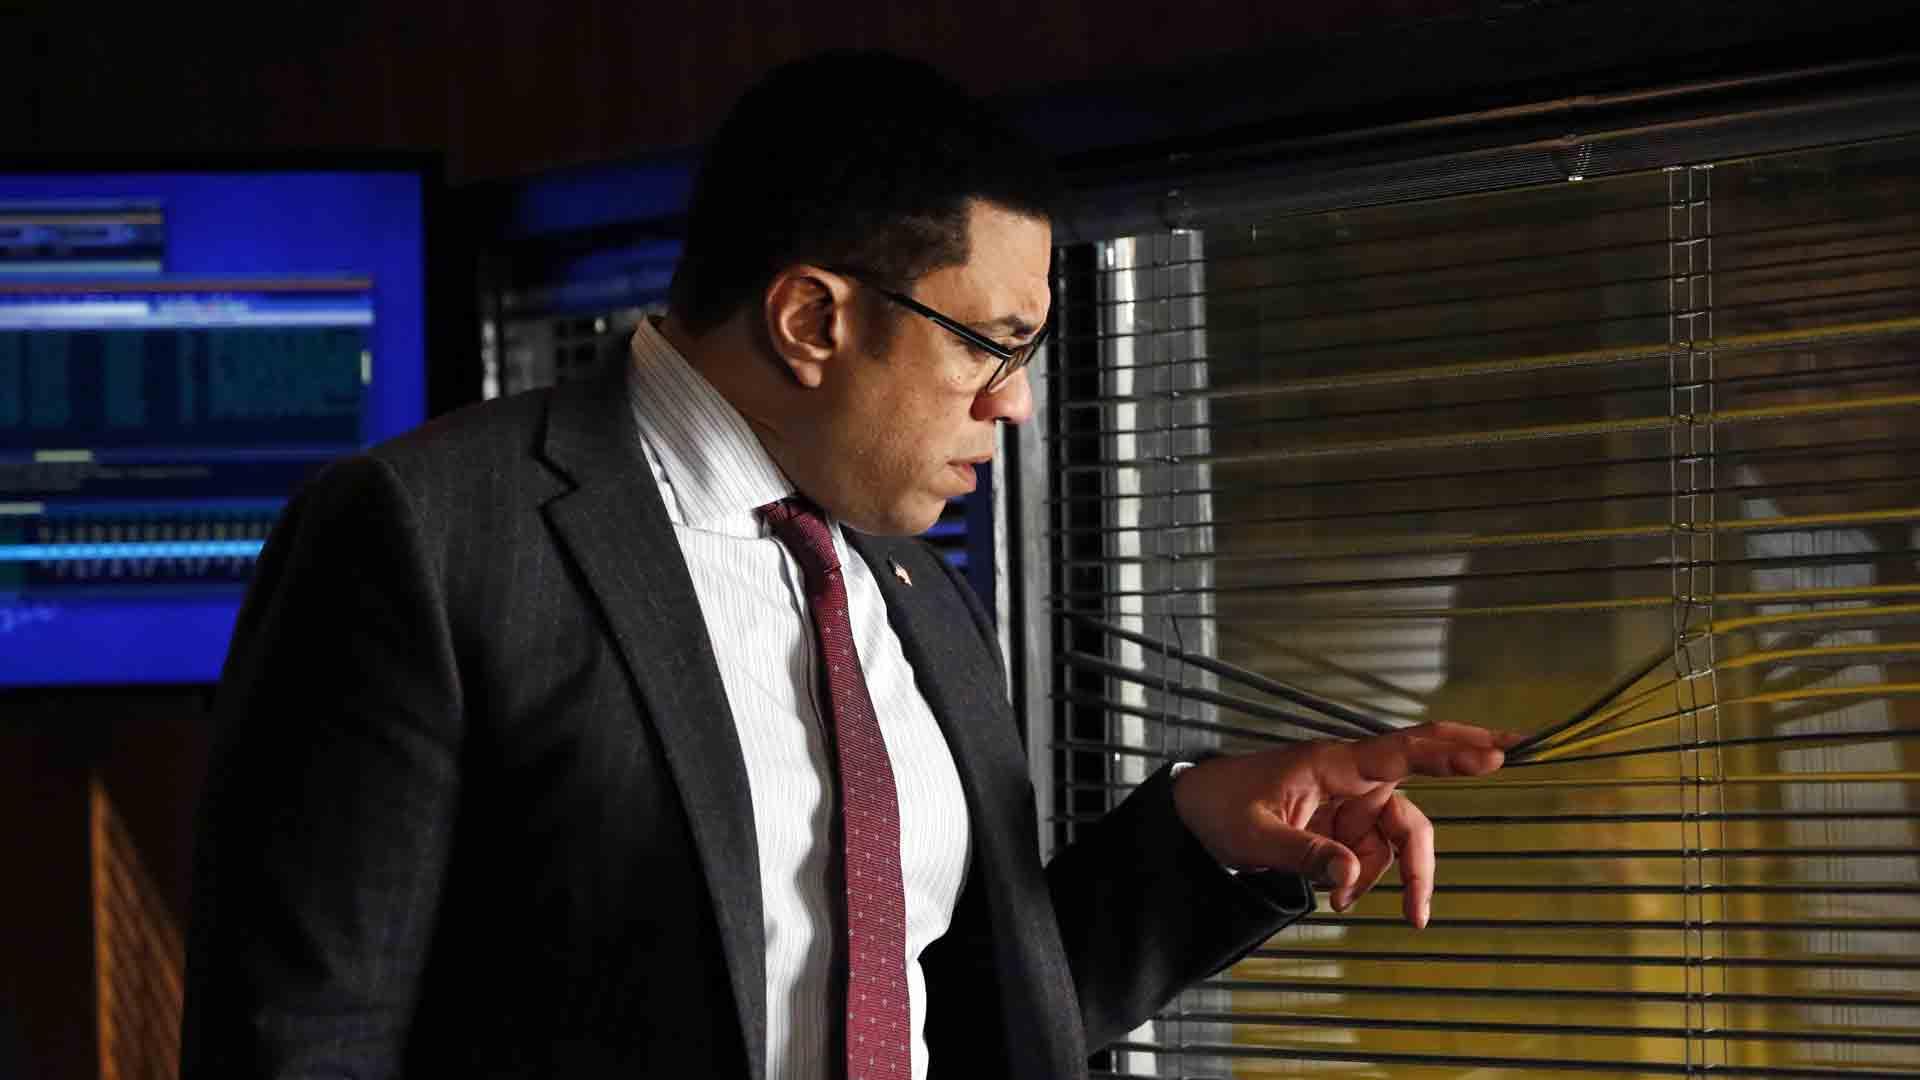 Watch The Blacklist Episodes - NBC com